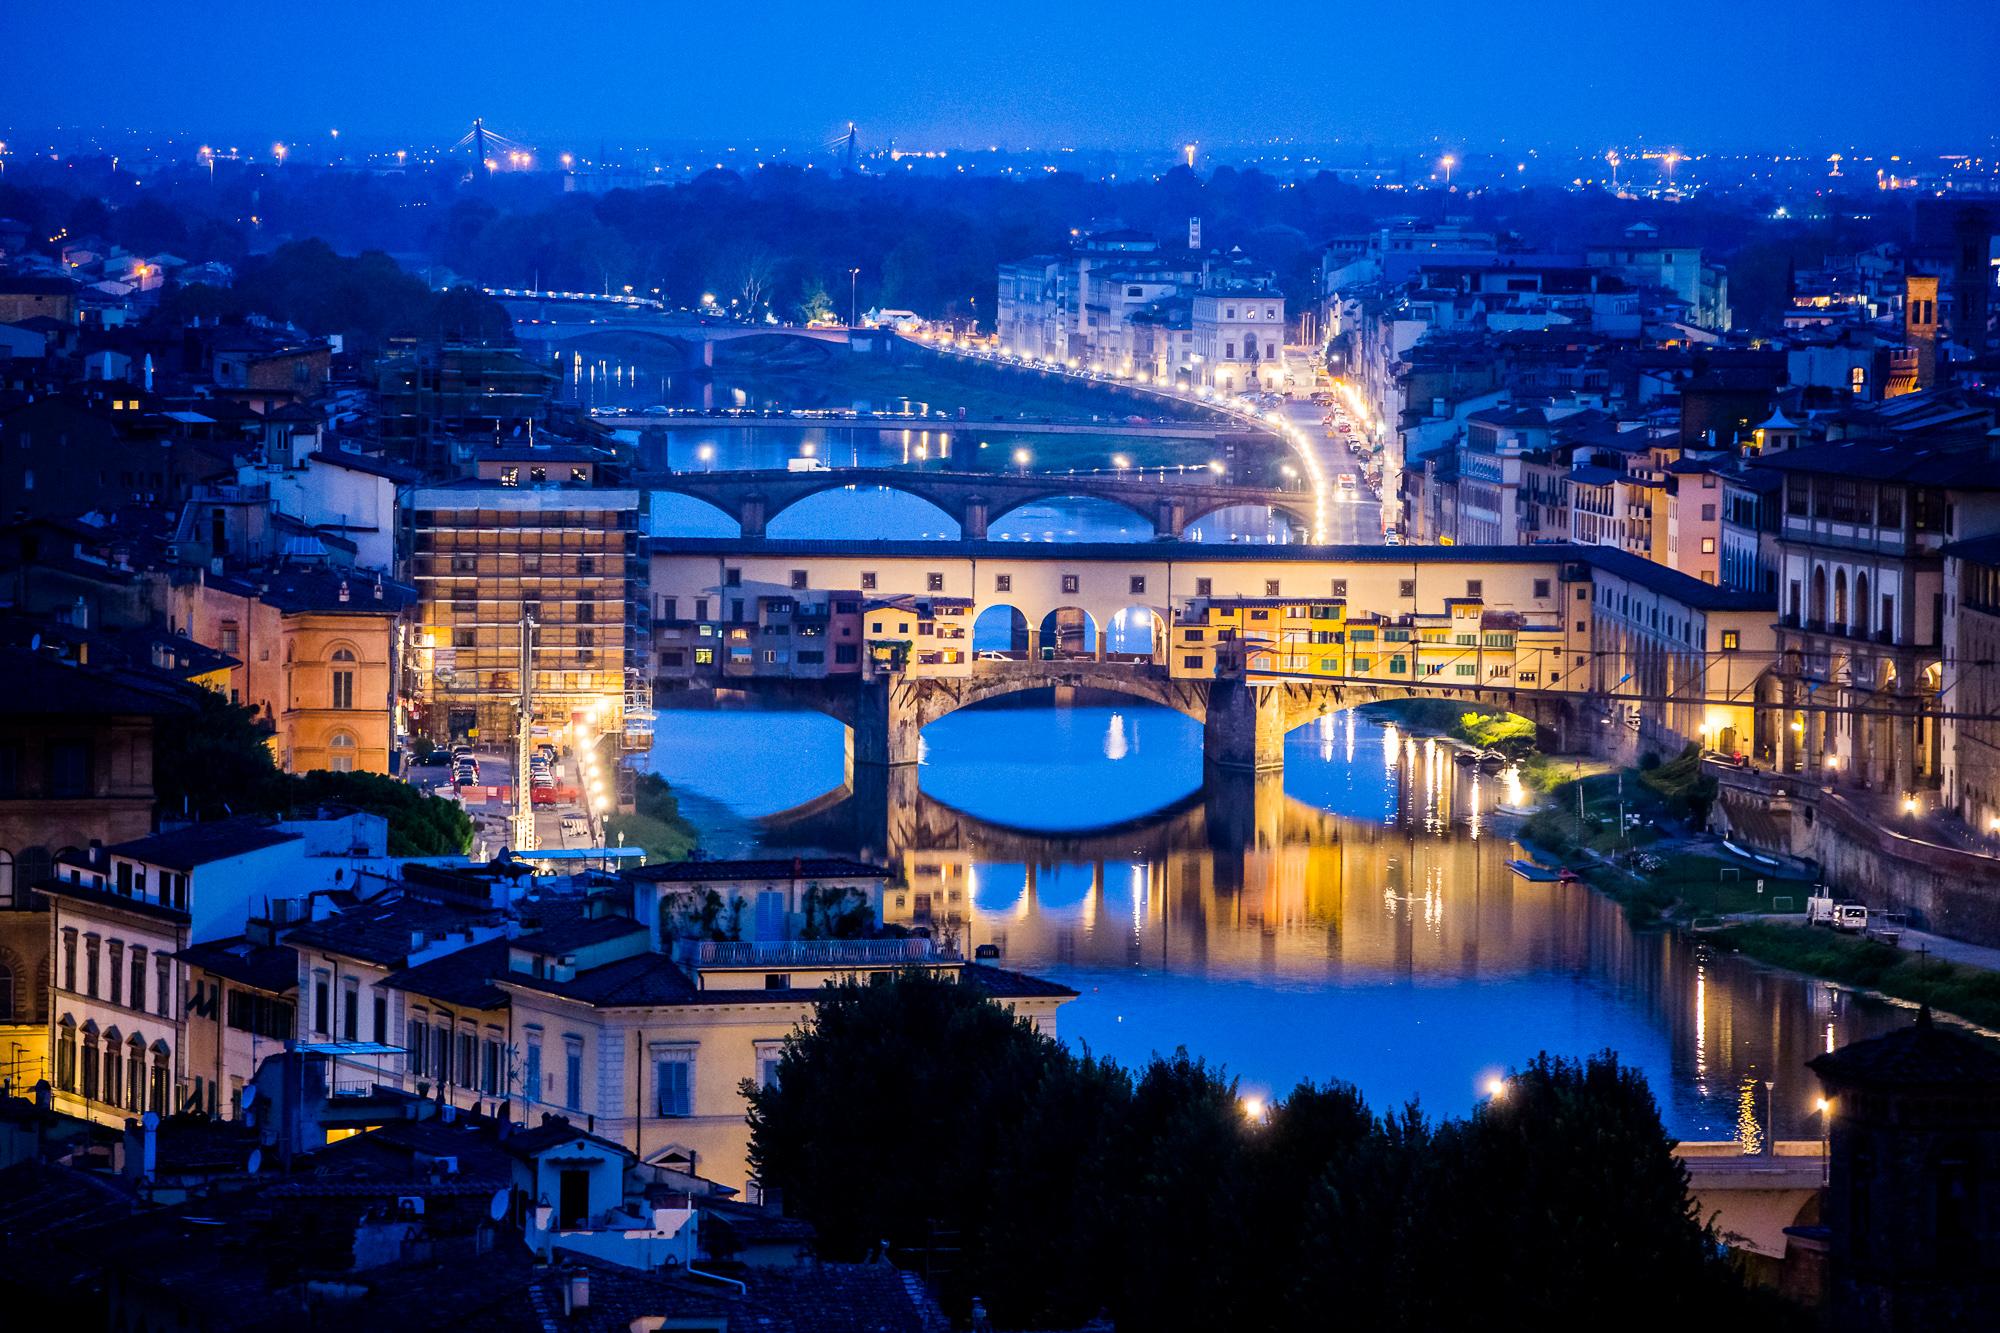 Travel Photography - Italy